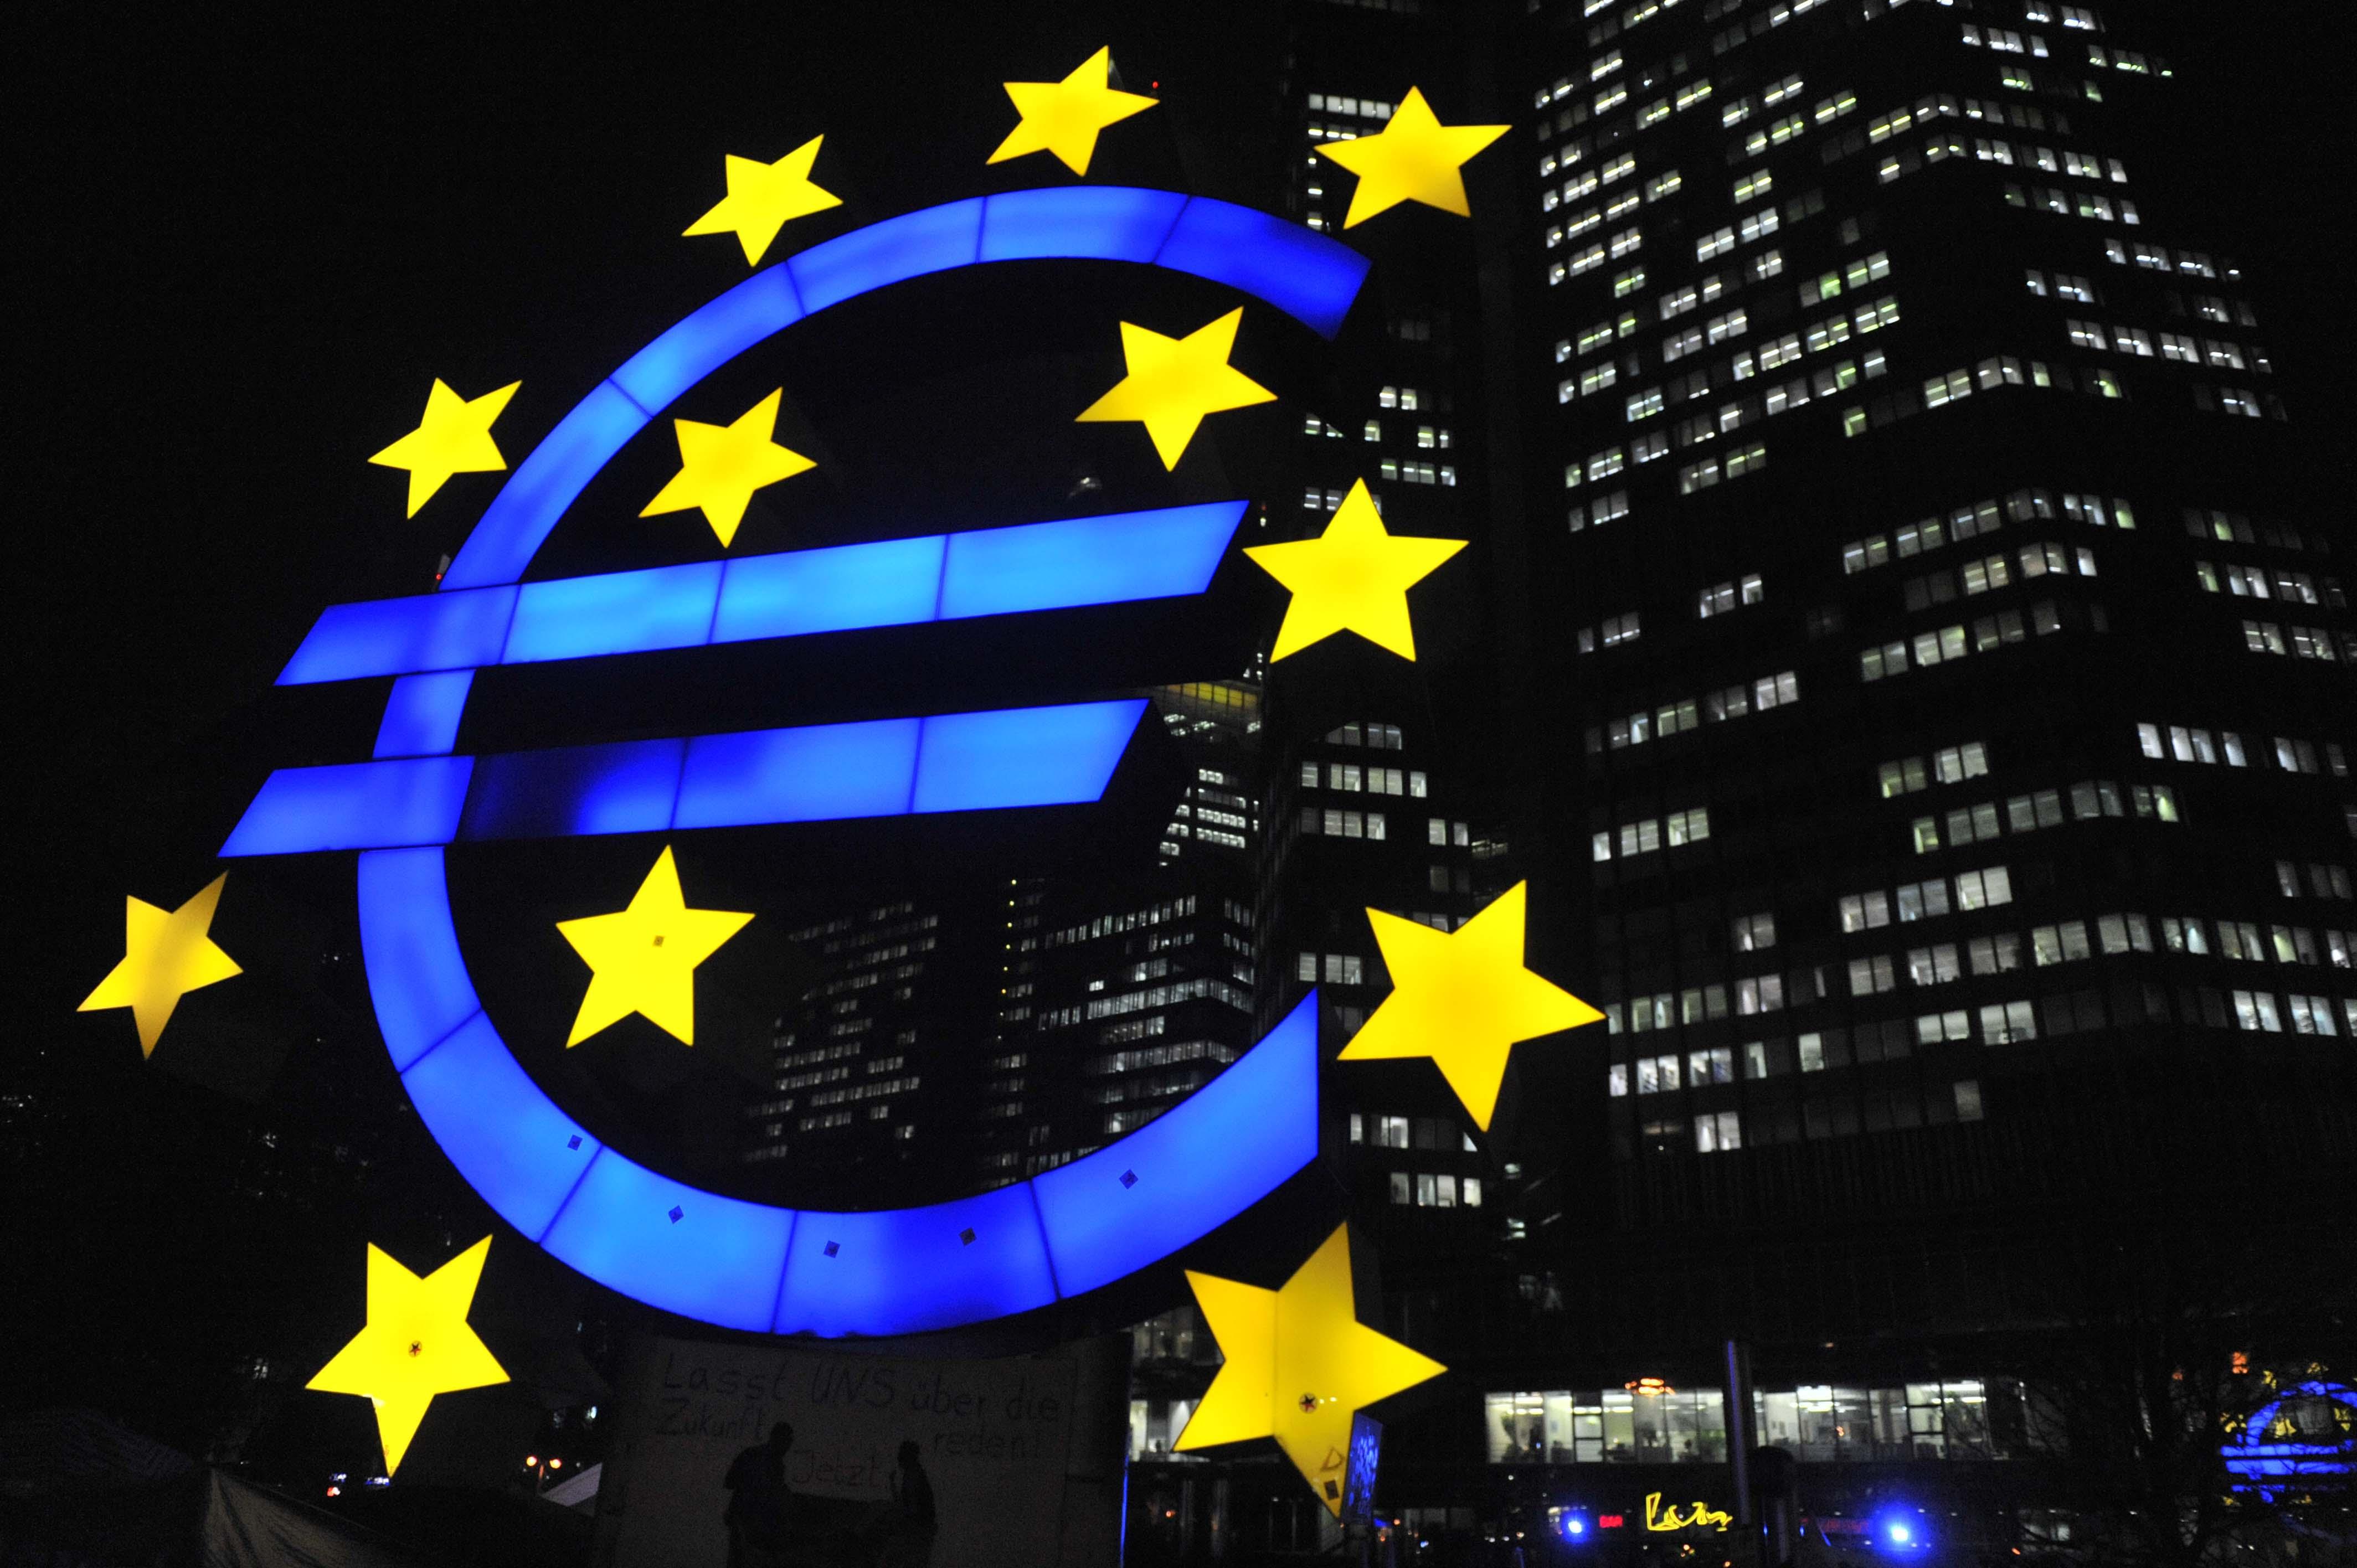 SIA e Colt vincono in Ungheria su Target2-Securities (T2S)